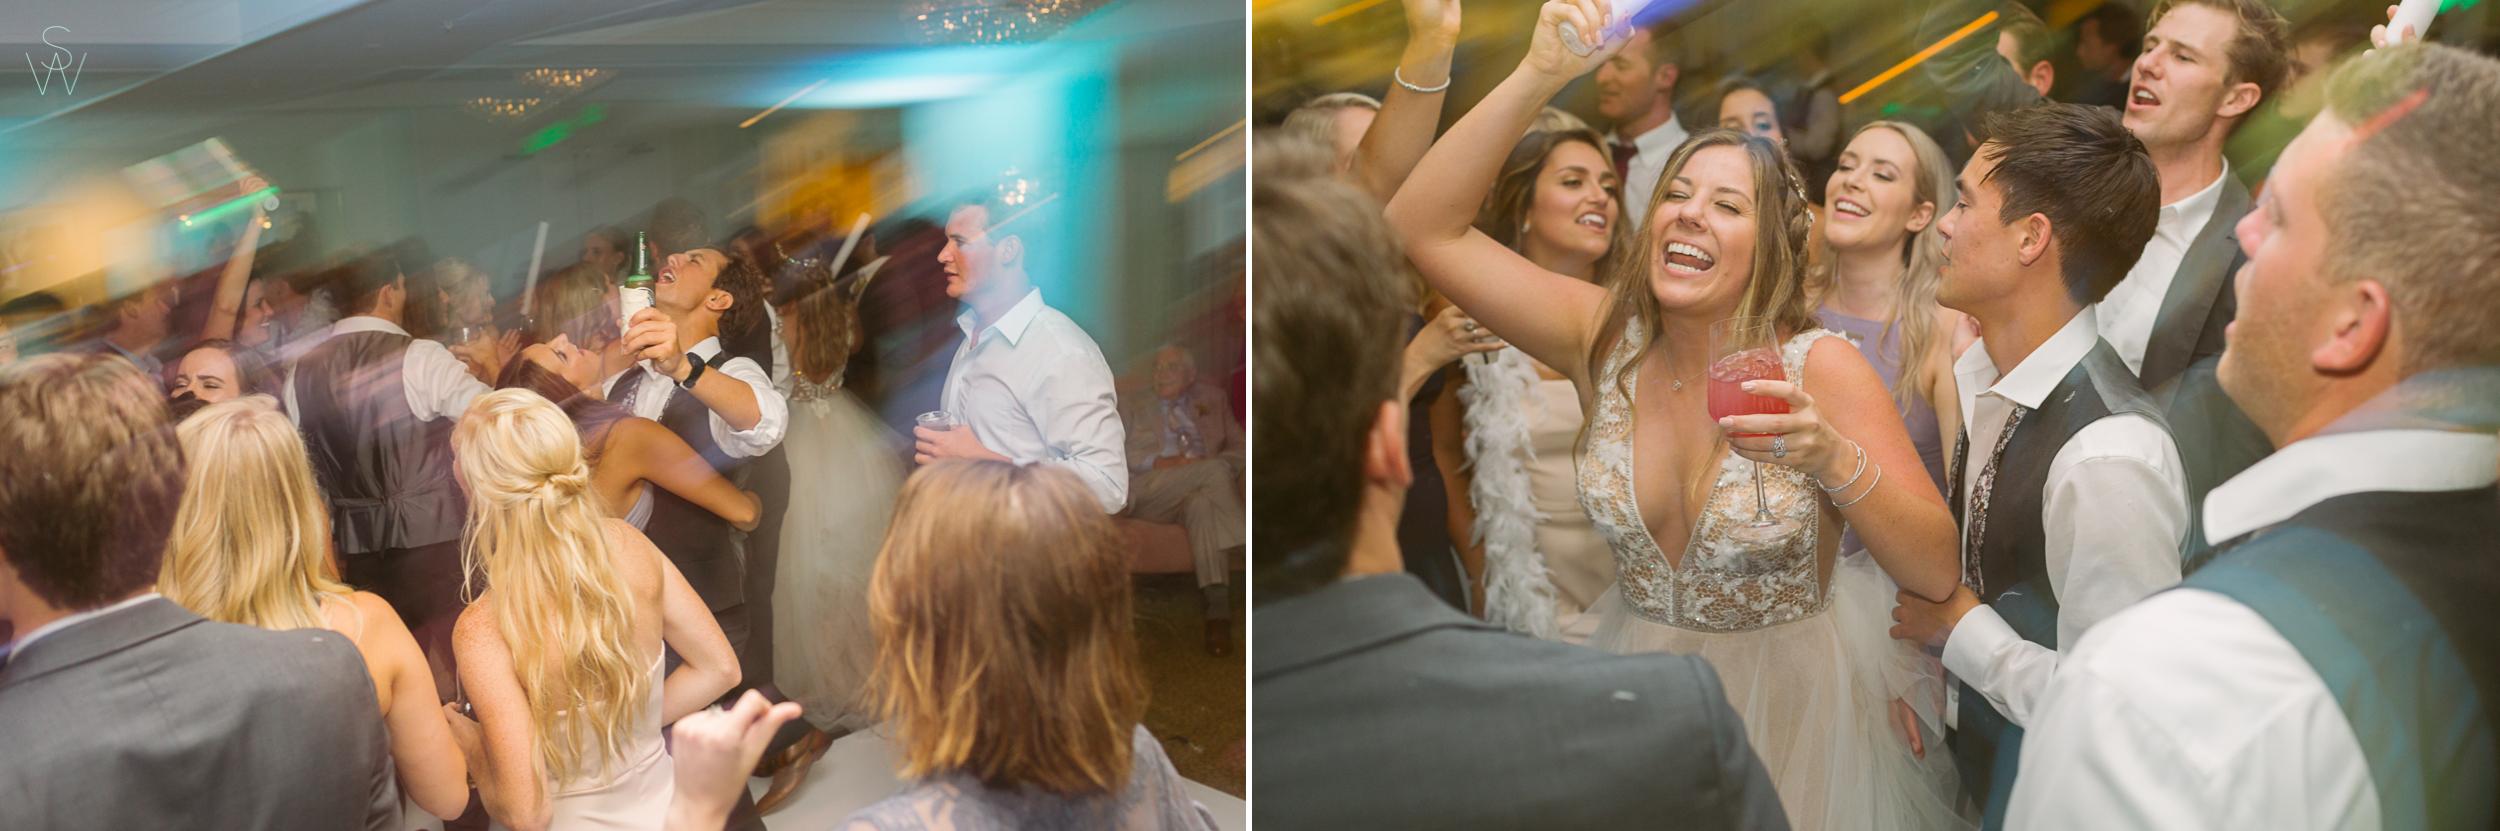 245Lauberge.shewanders.wedding.photography.JPG